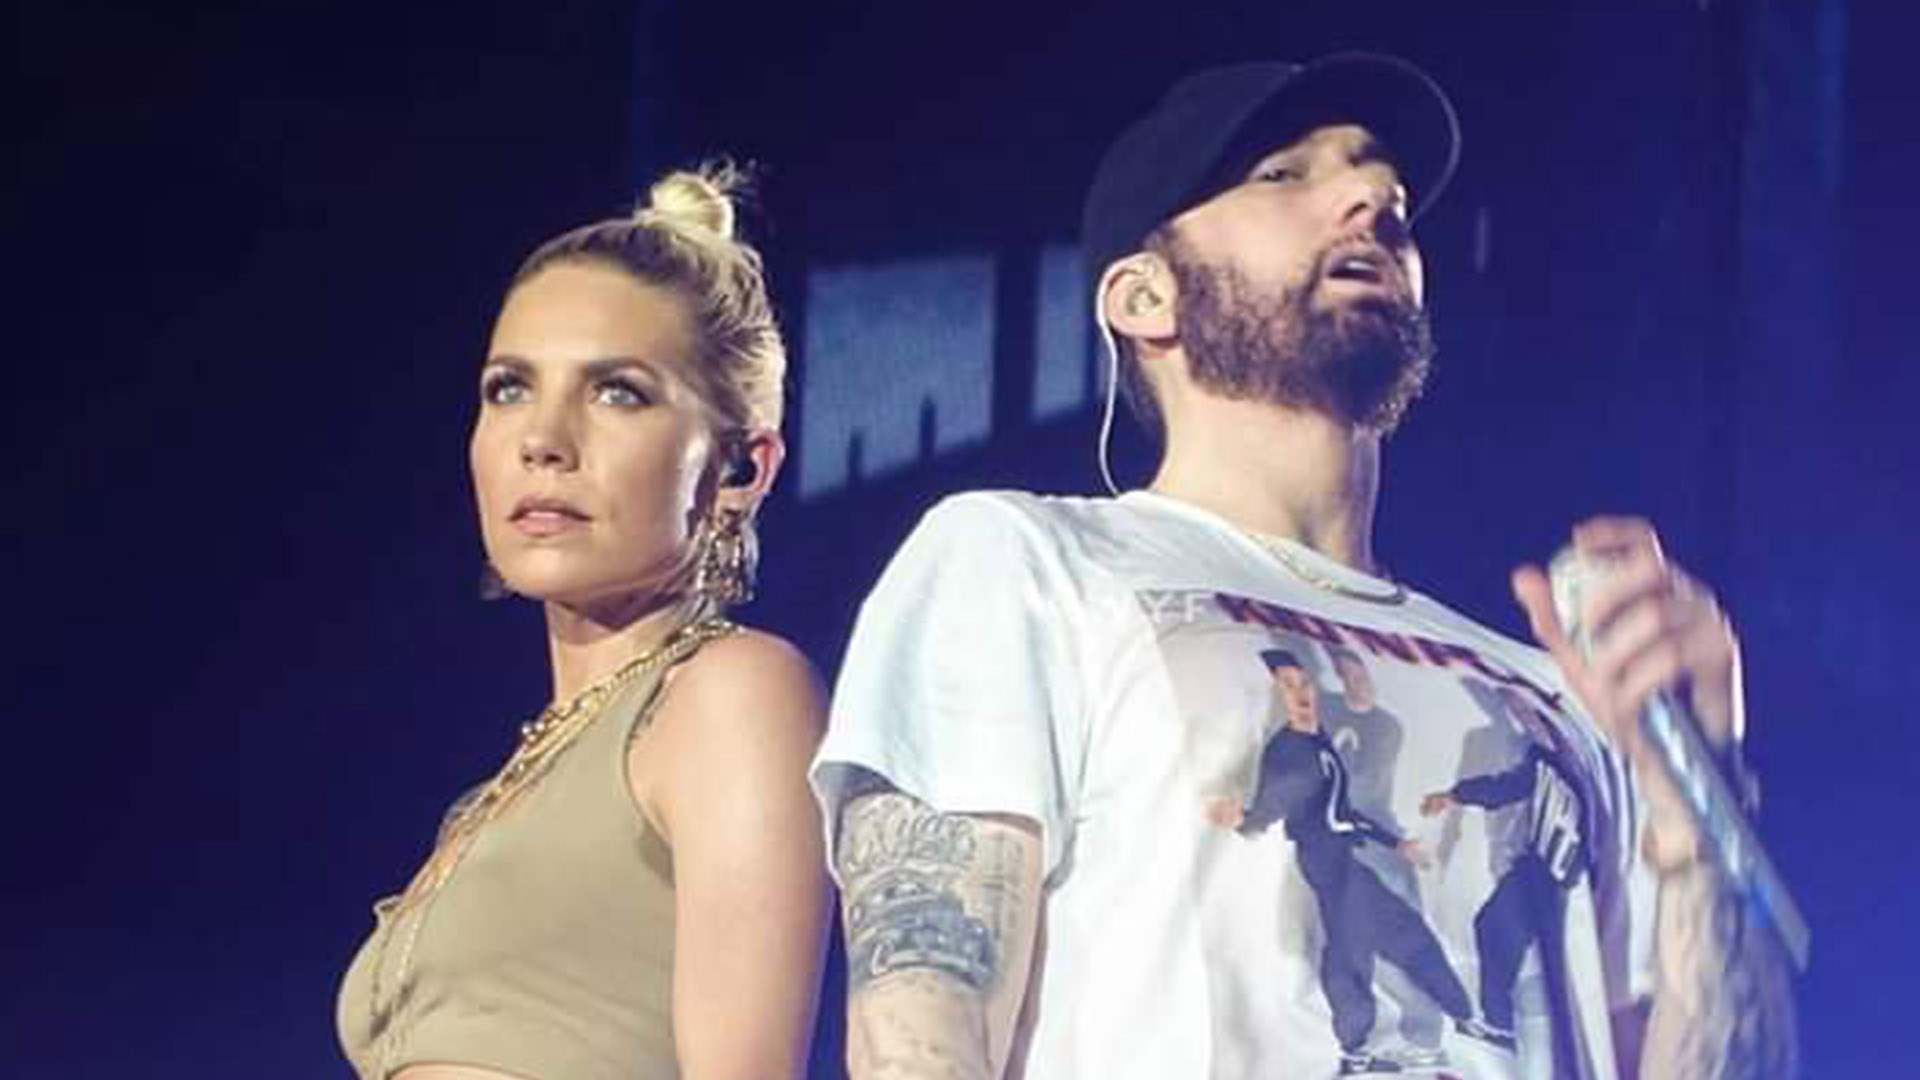 Eminem and Skylar Grey at Abu Dhabi, 25.10.2019 📸 @paulawyf